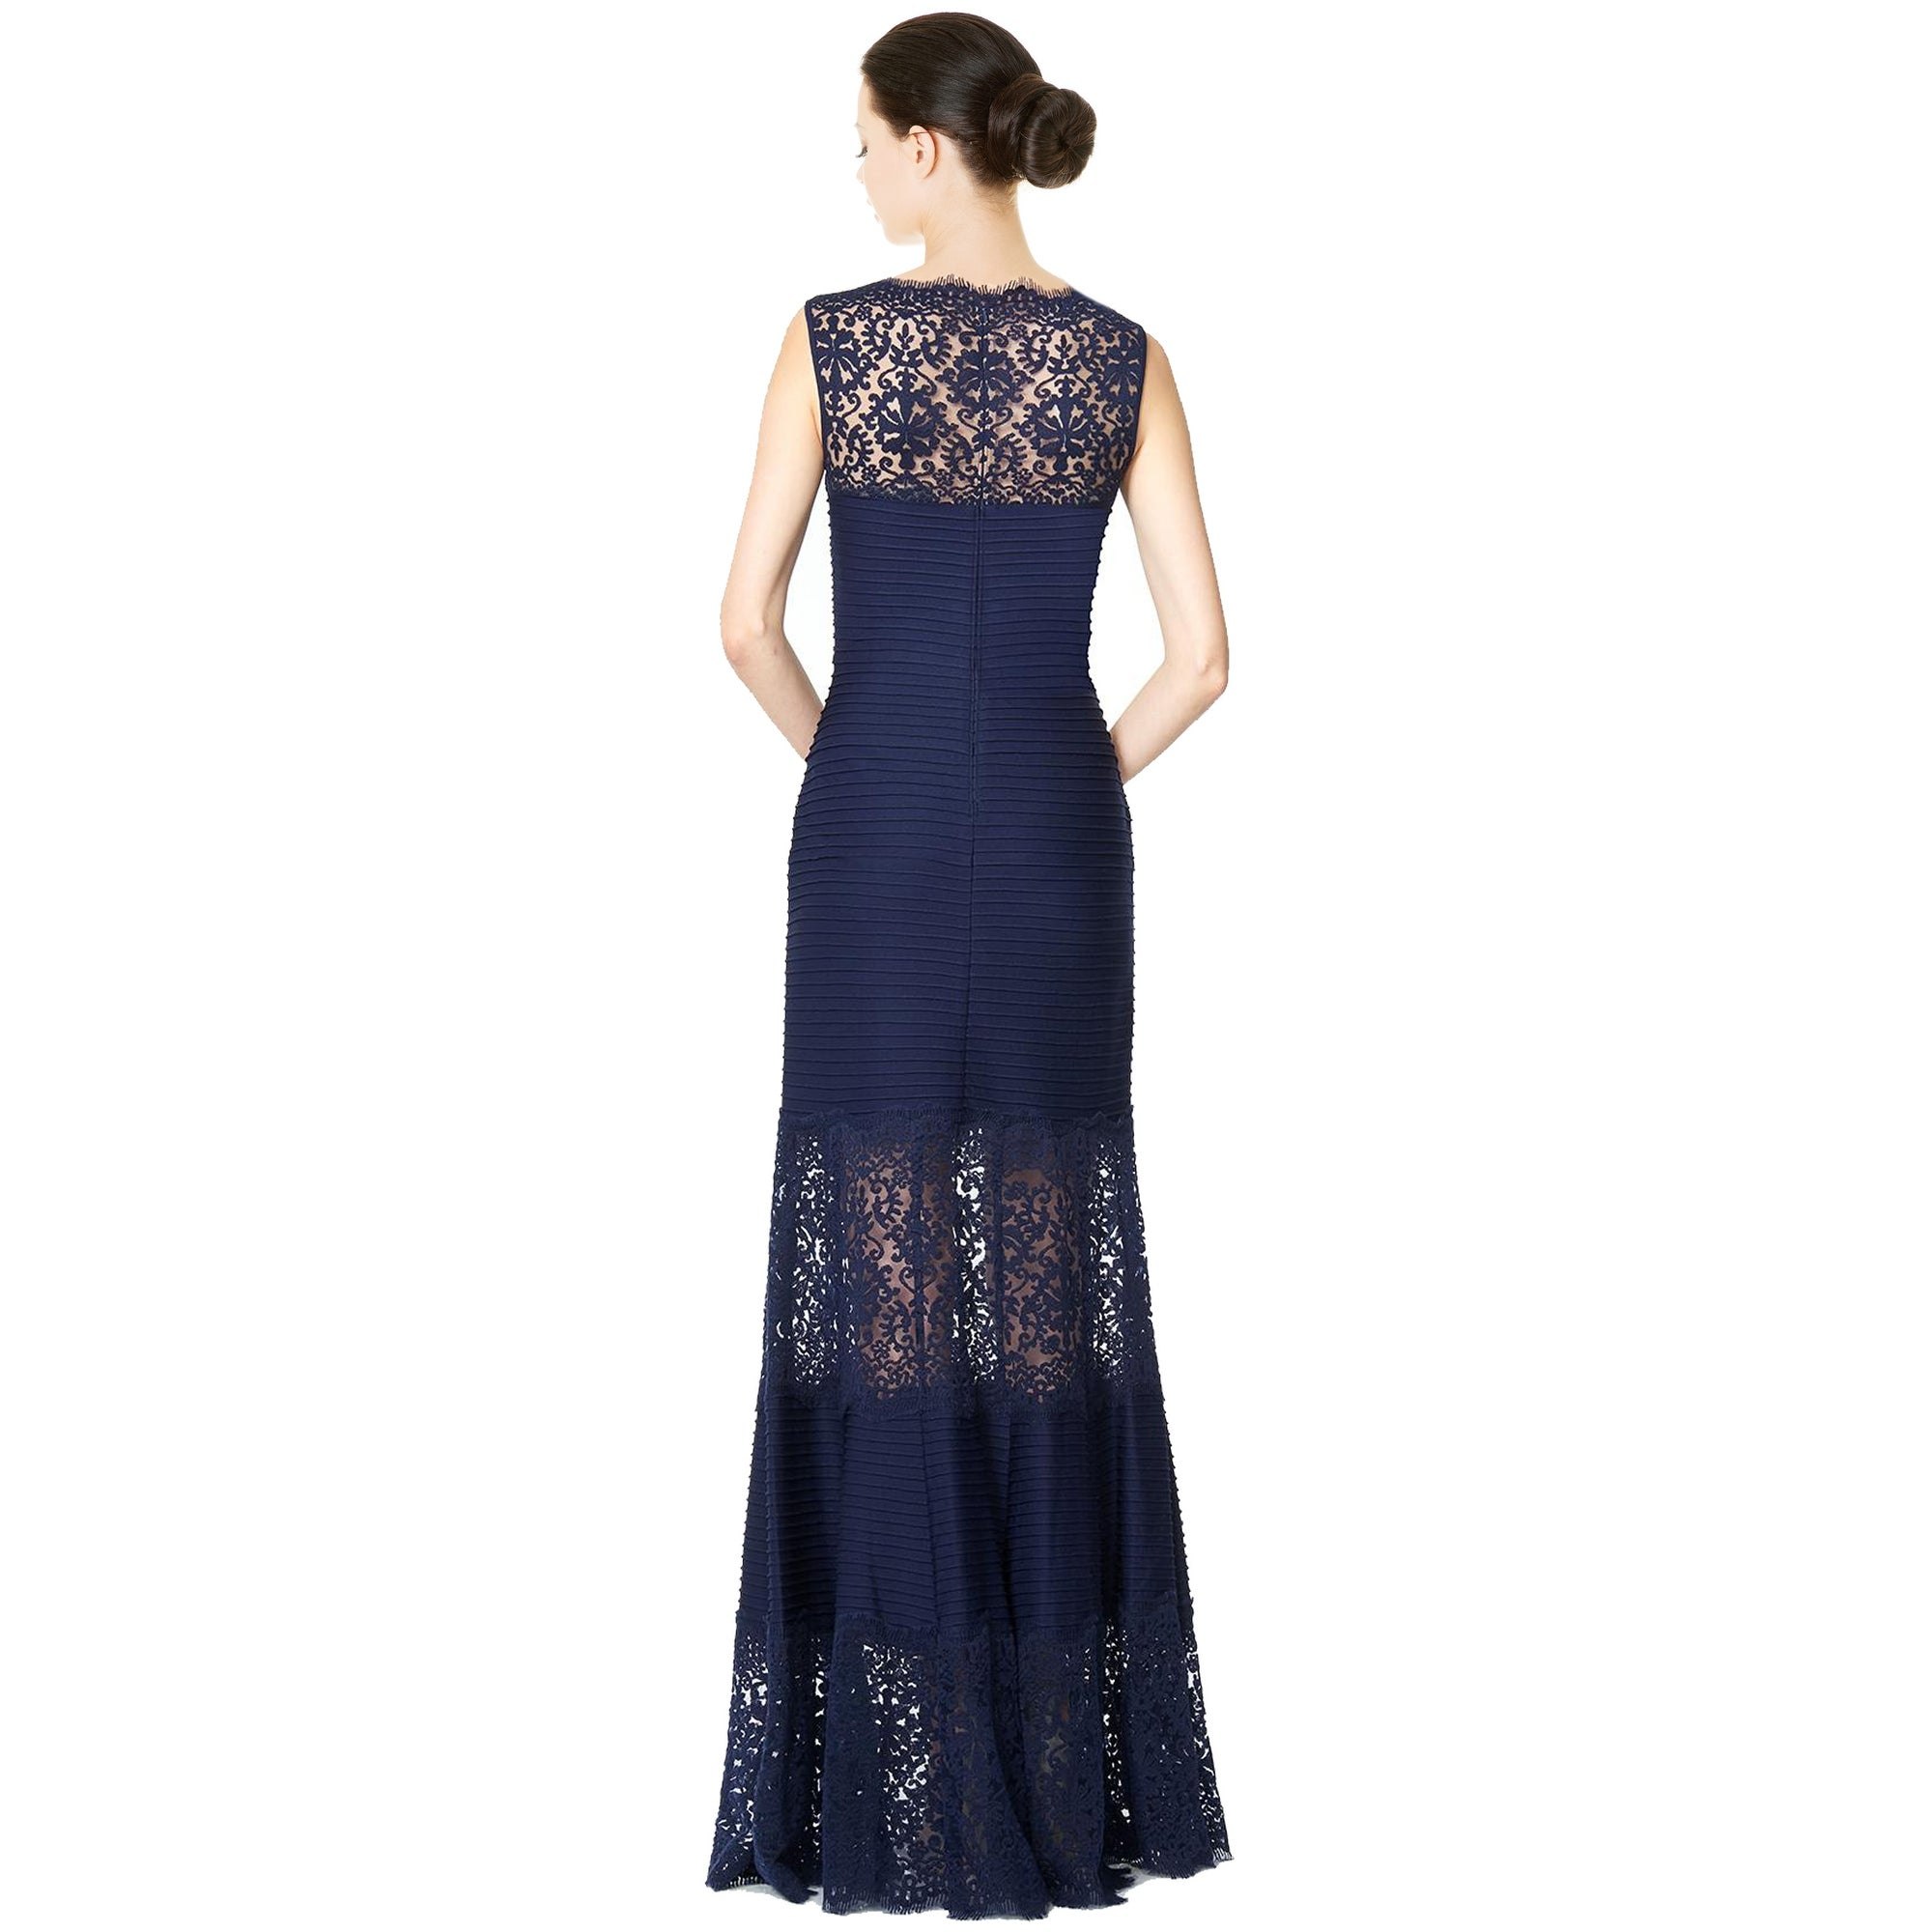 2e7f4a4096d5 Shop Tadashi Shoji Lace Inset Sleeveless Mermaid Evening Gown Dress ...